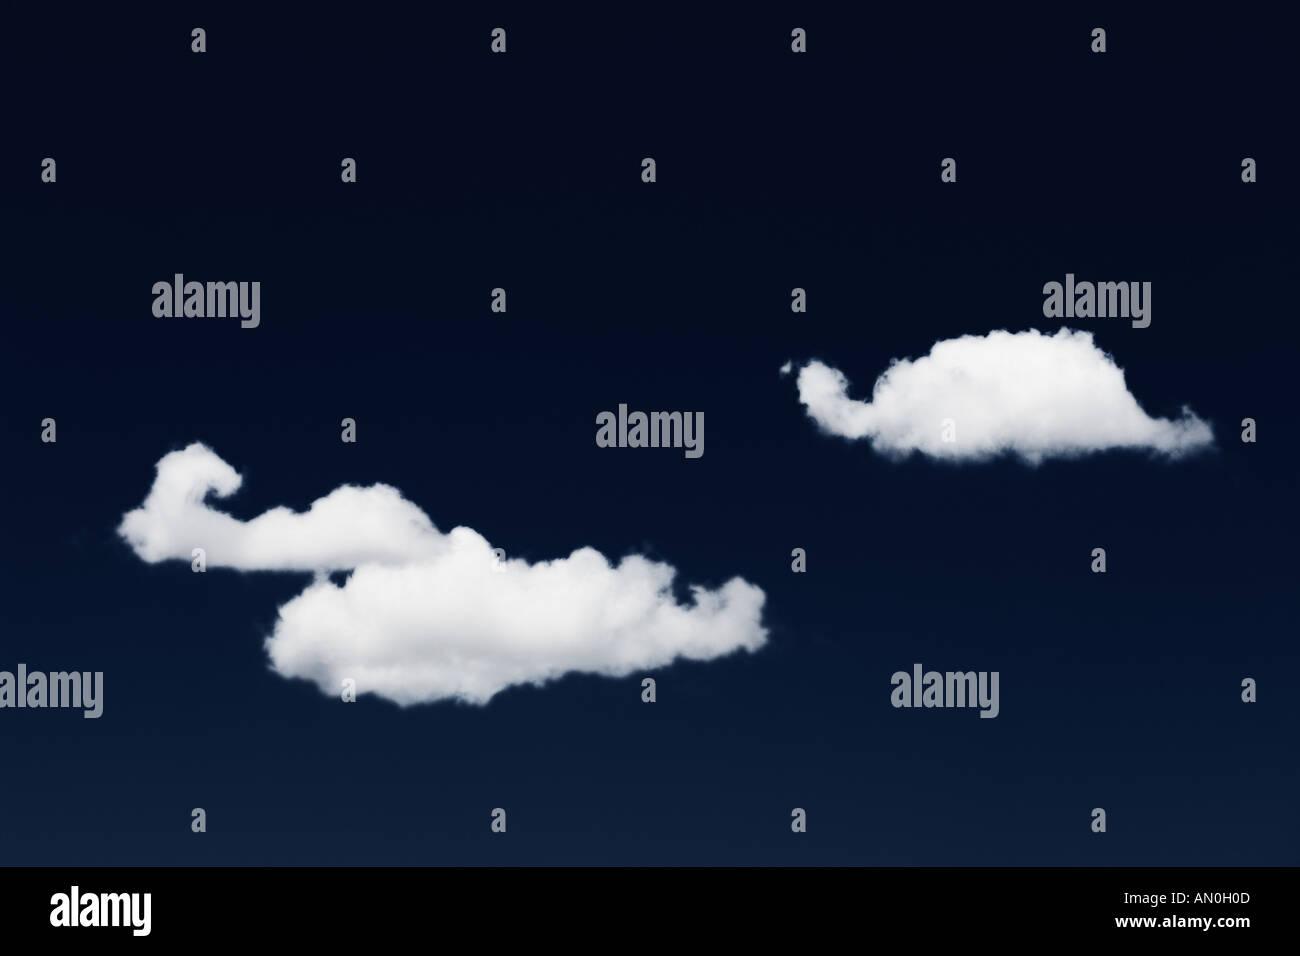 Three Clouds And Dark Blue Sky - Stock Image